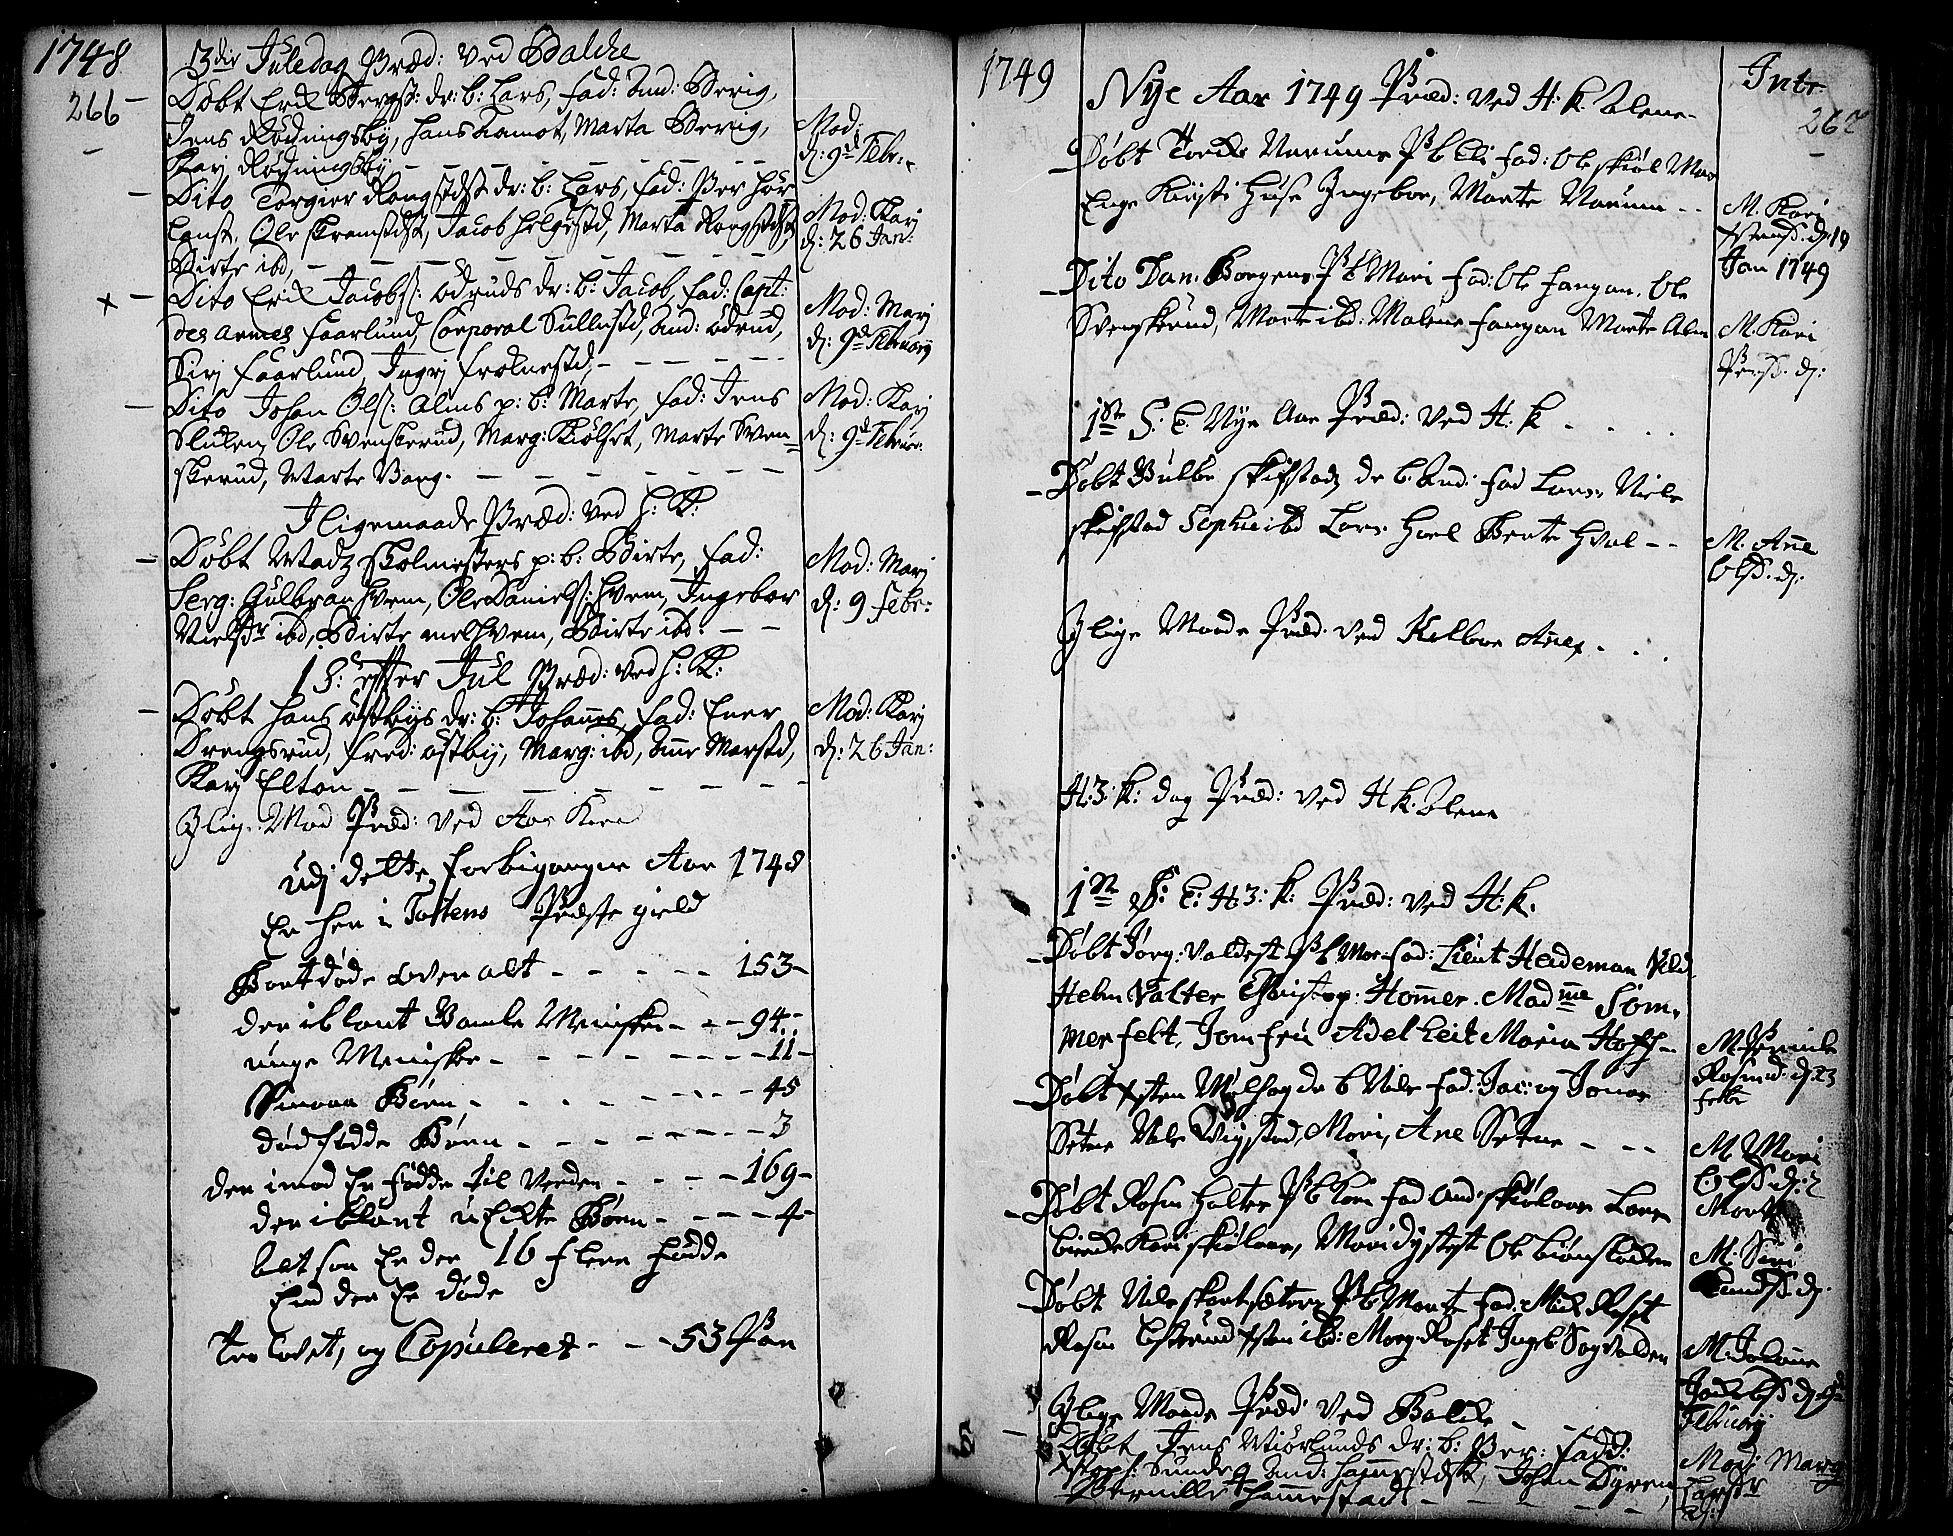 SAH, Toten prestekontor, Ministerialbok nr. 3, 1734-1751, s. 266-267